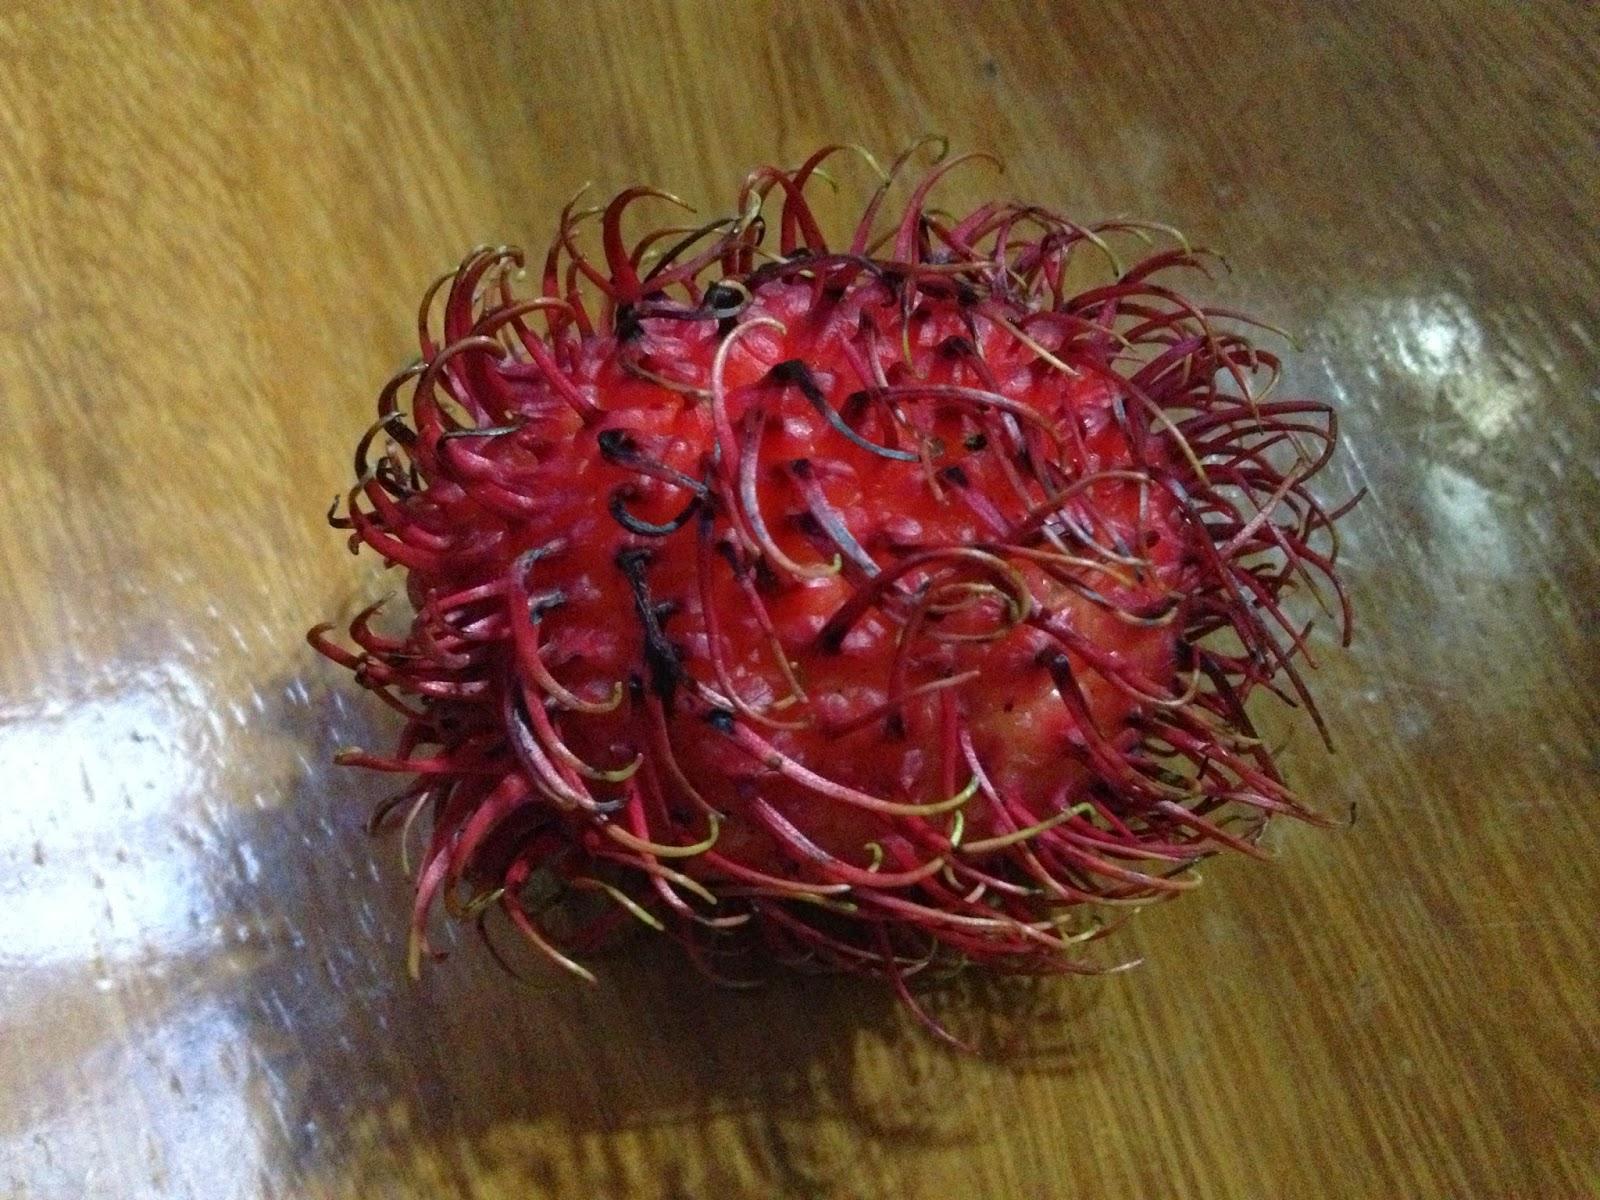 De Rica Mamon Costa Frutas